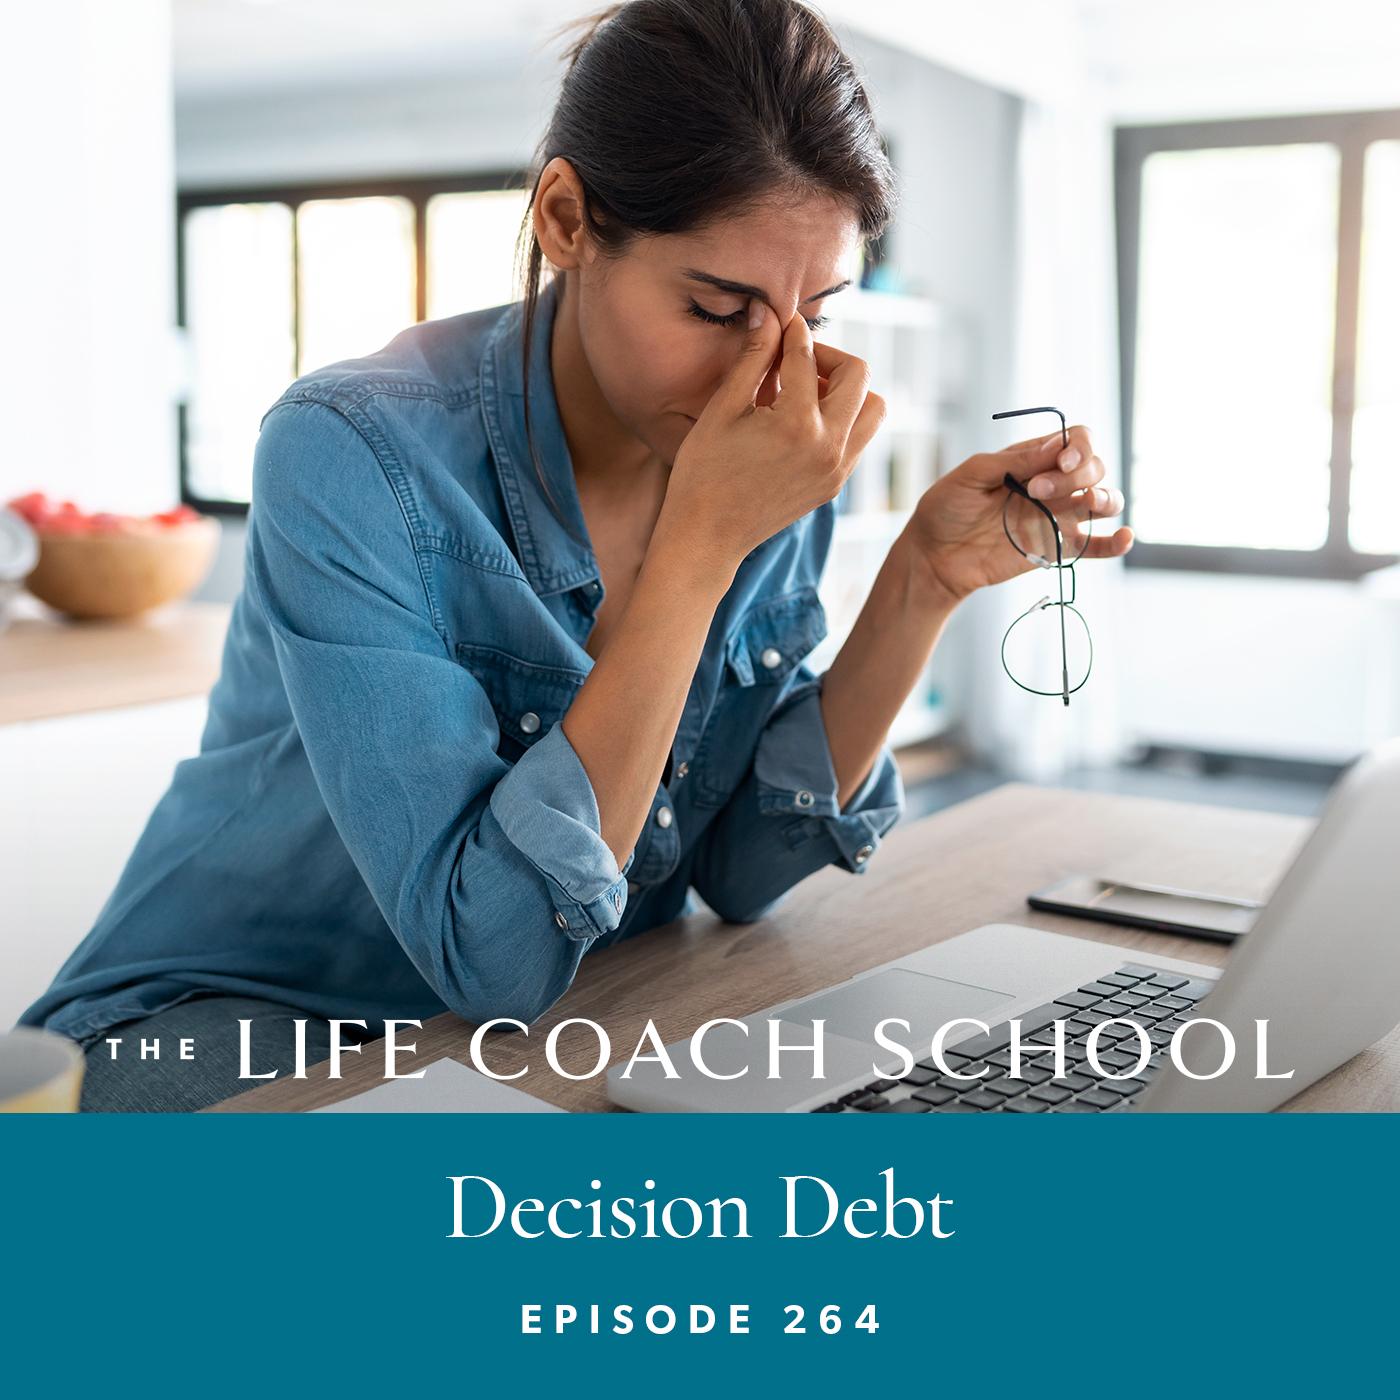 The Life Coach School Podcast with Brooke Castillo | Episode 264 | Decision Debt